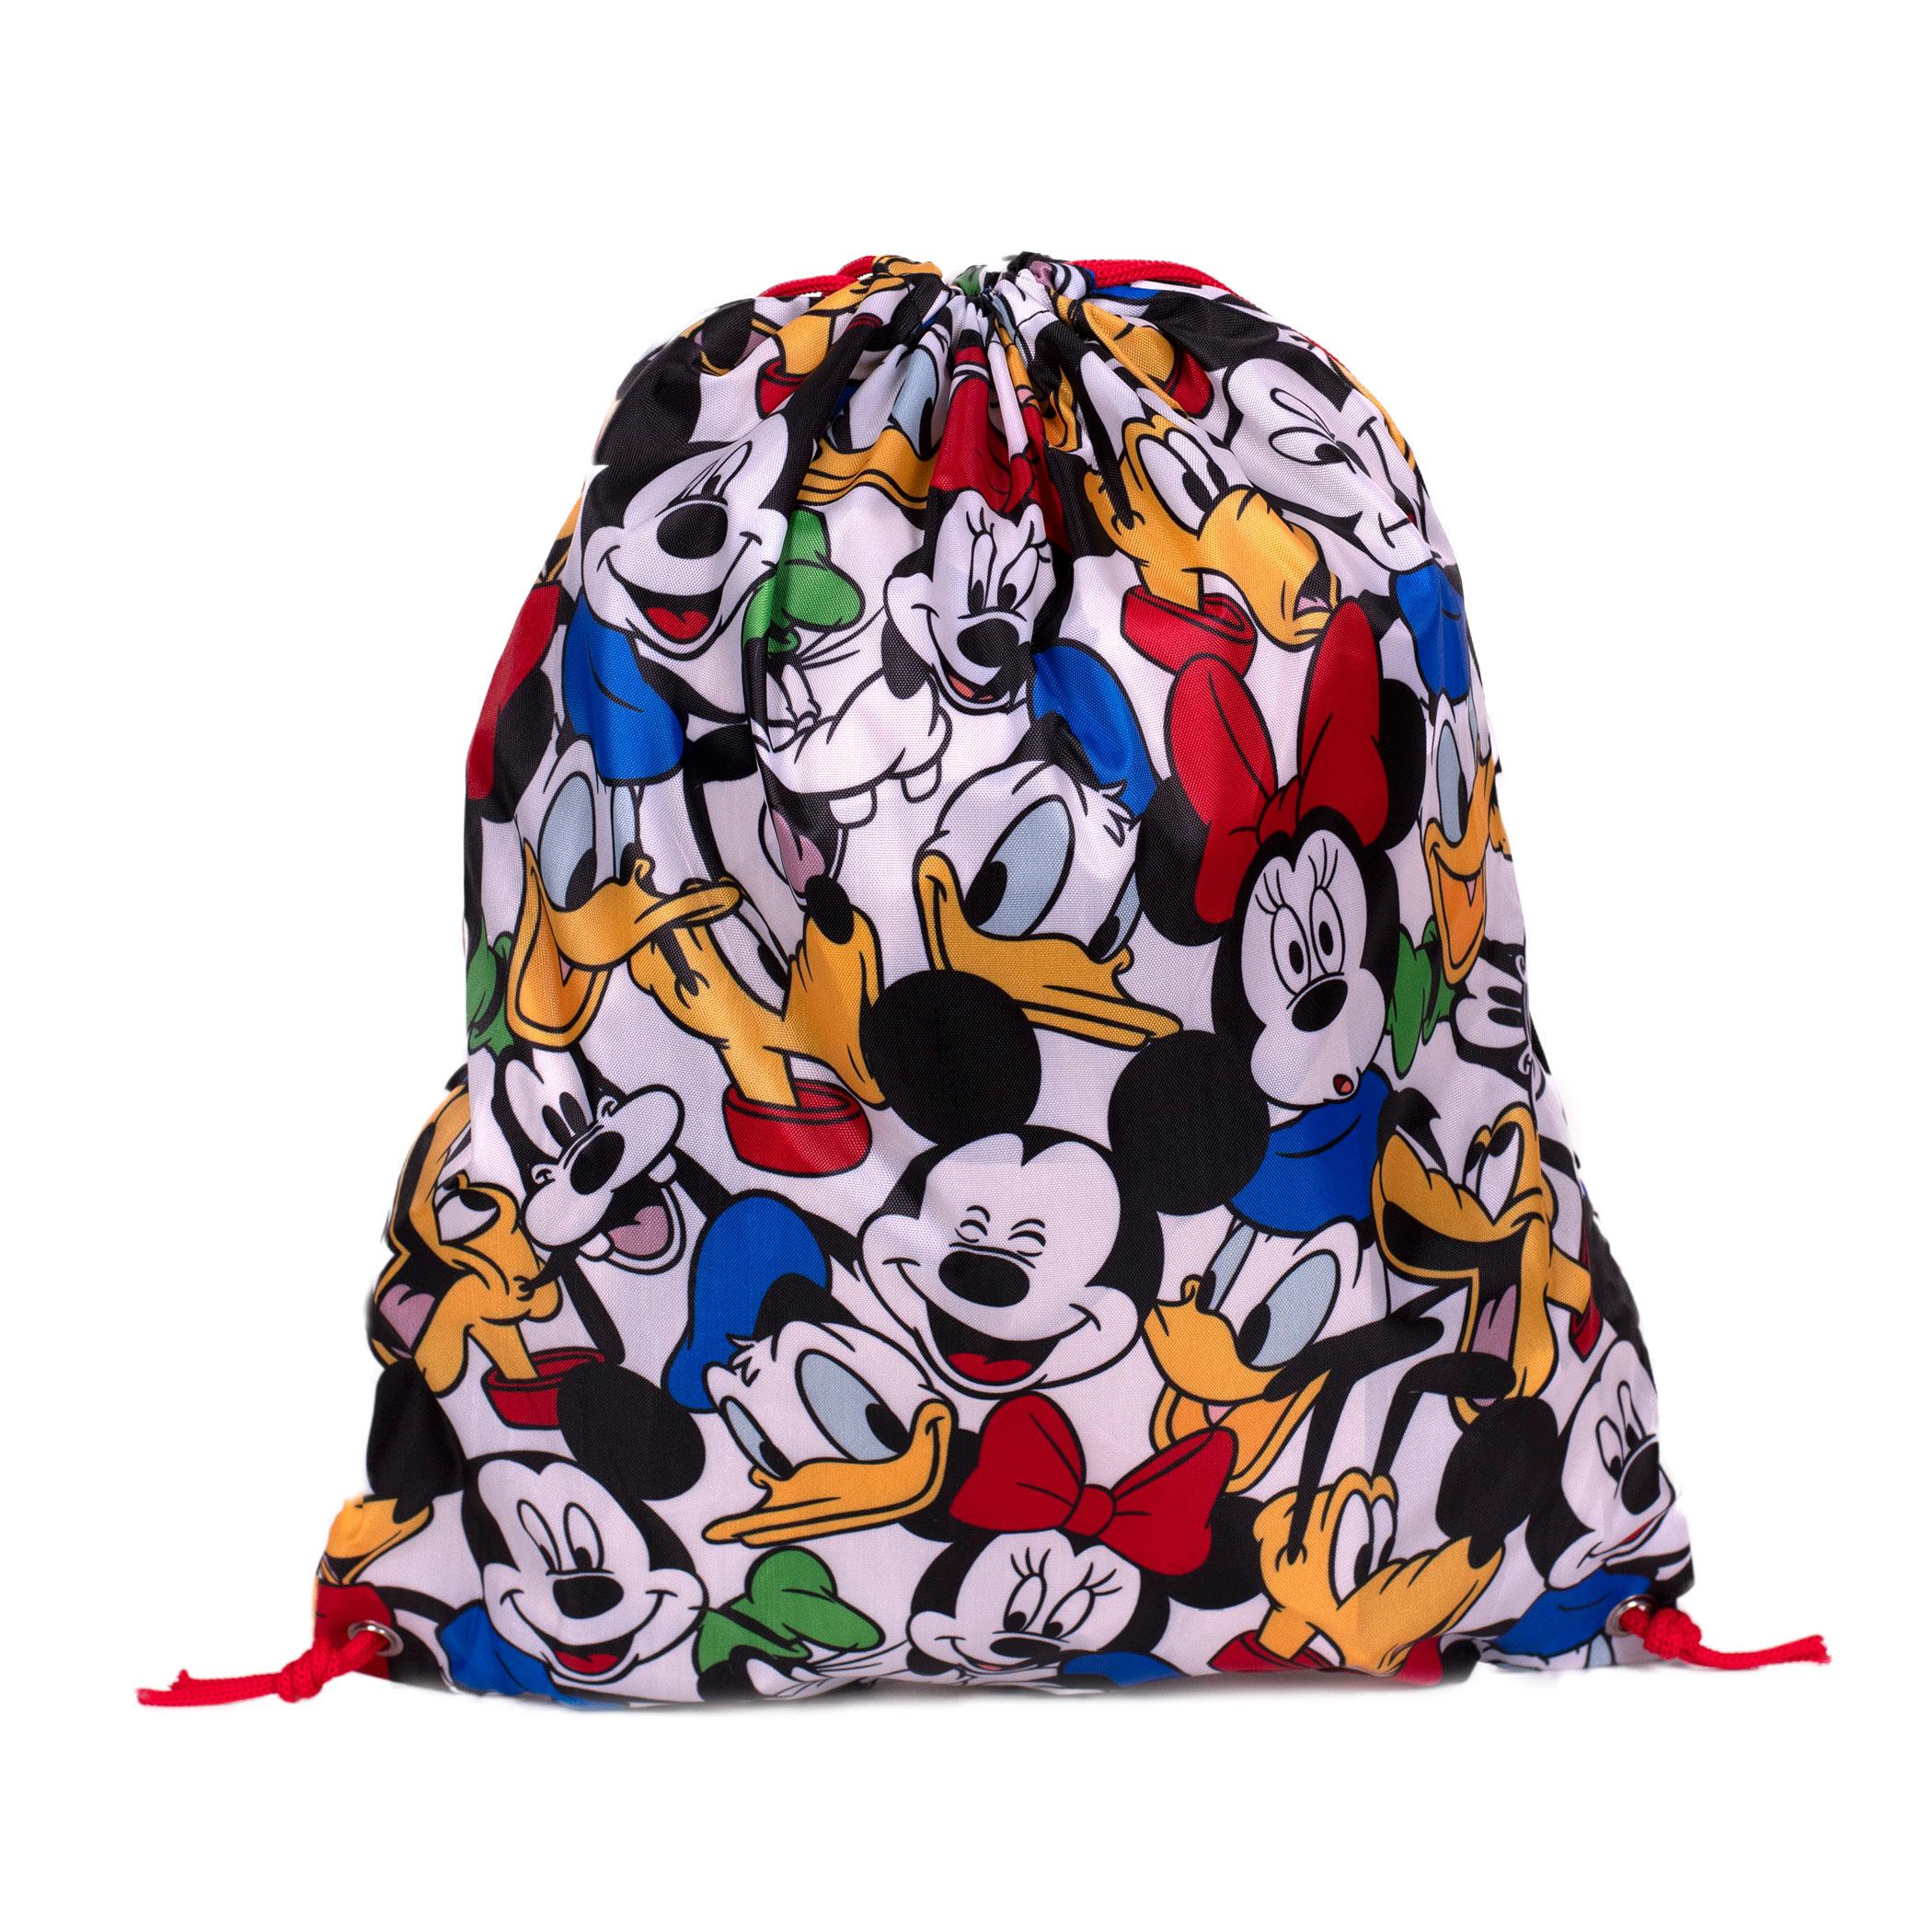 Disney Faces Drawstring Bag